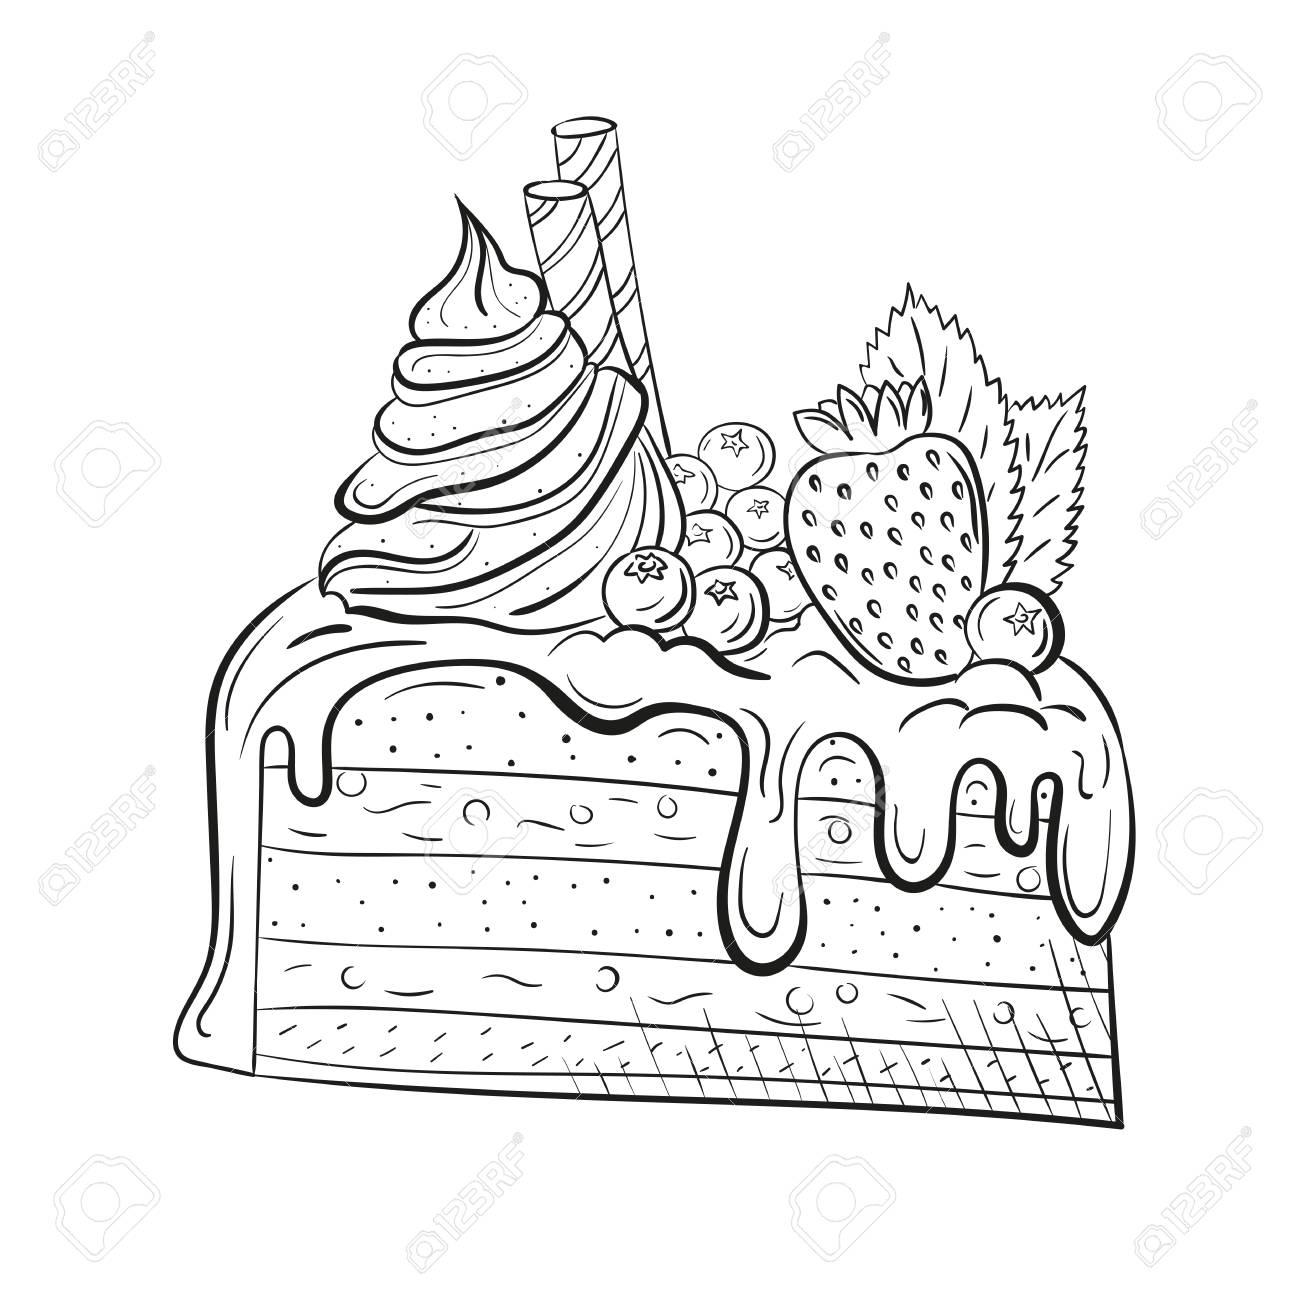 hight resolution of sweet beautiful dessert clipart for a restaurant